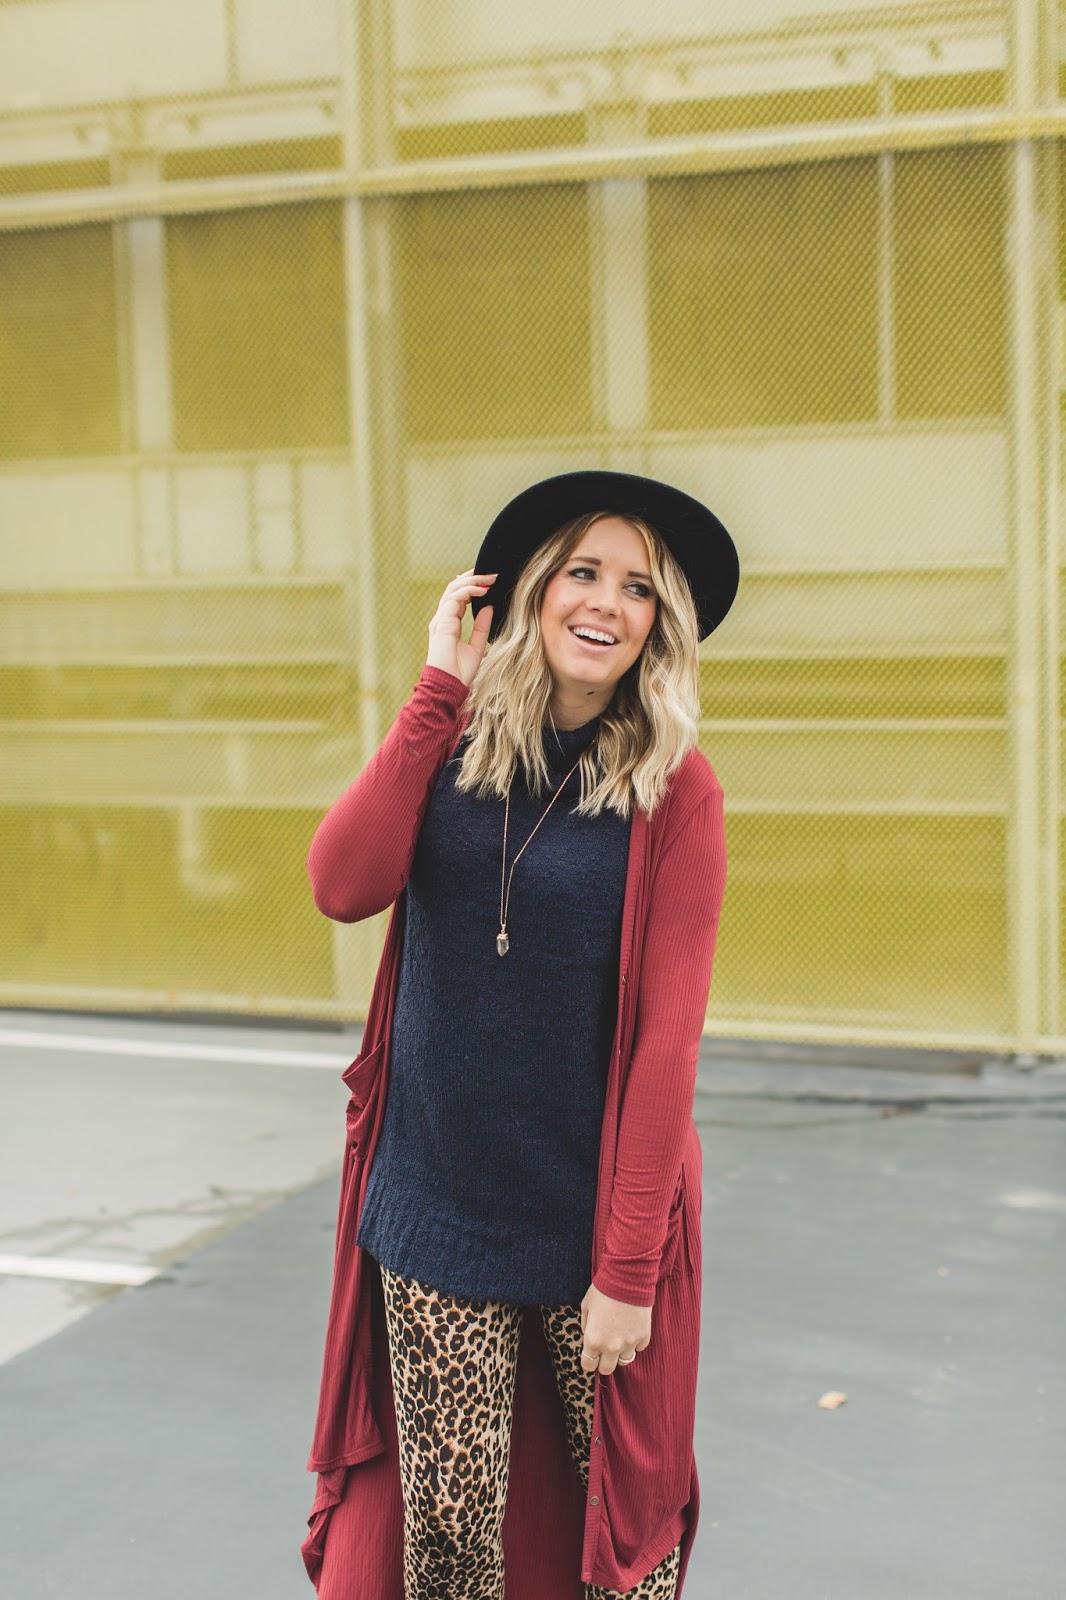 Layers, Utah Fashion Blogger, Leopard Leggings